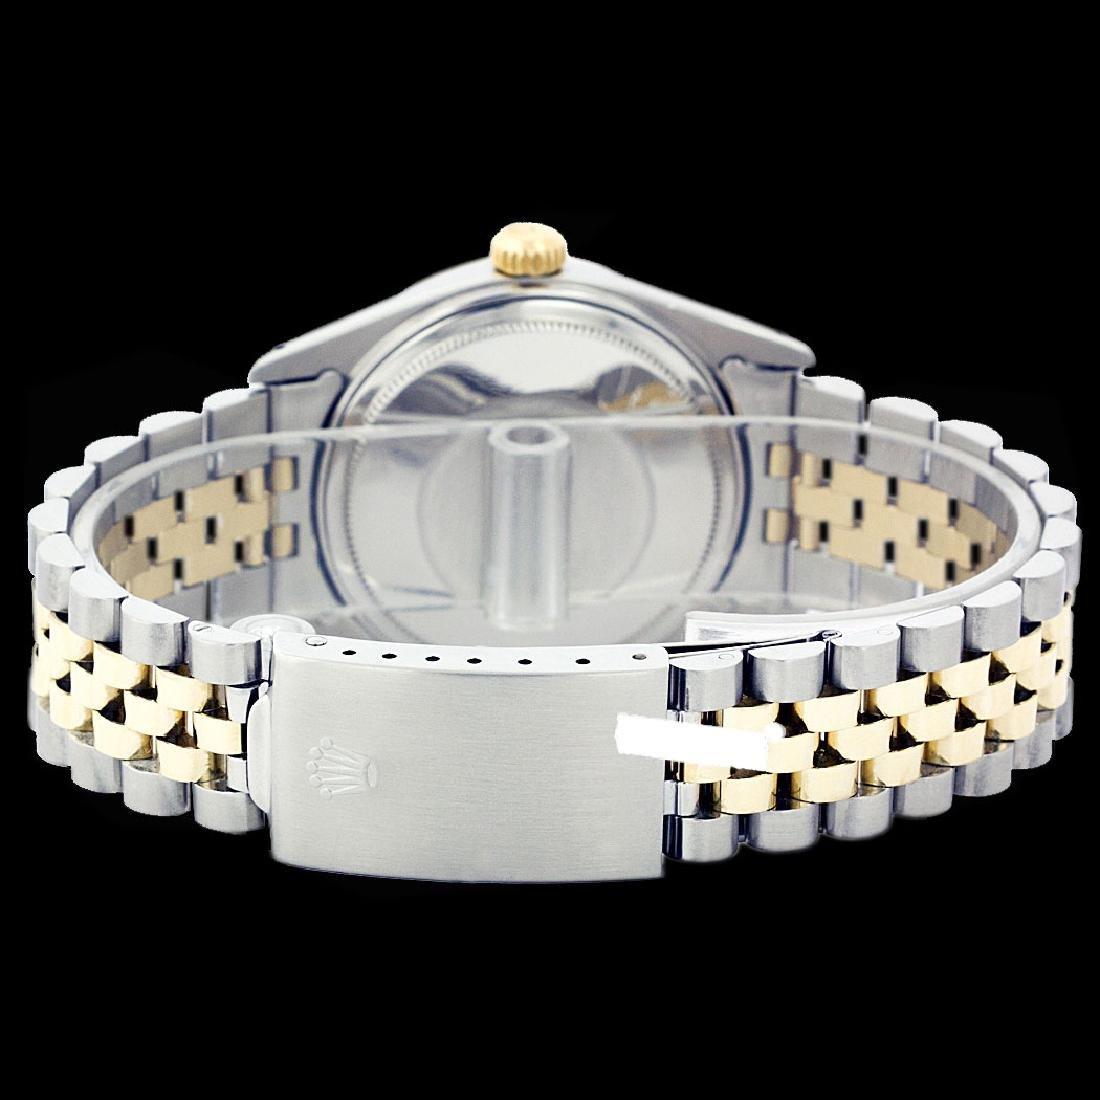 Rolex Men's Two Tone 14K Gold/SS, QuickSet, Diam Dial & - 3